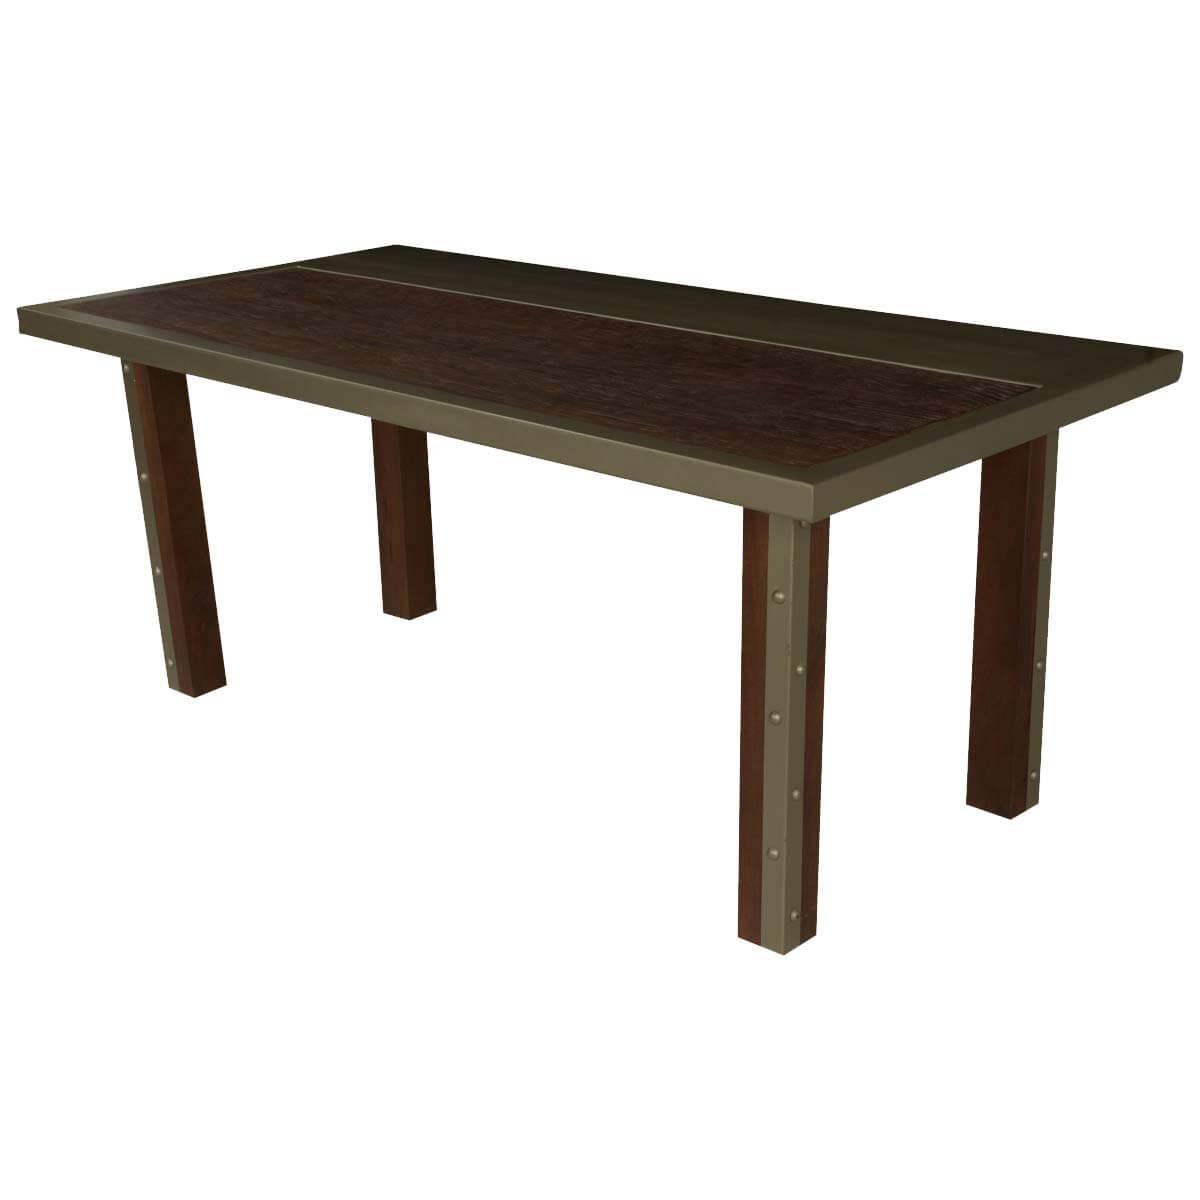 "Modern Industrial Mango Wood & Iron 71"" Dining Table"